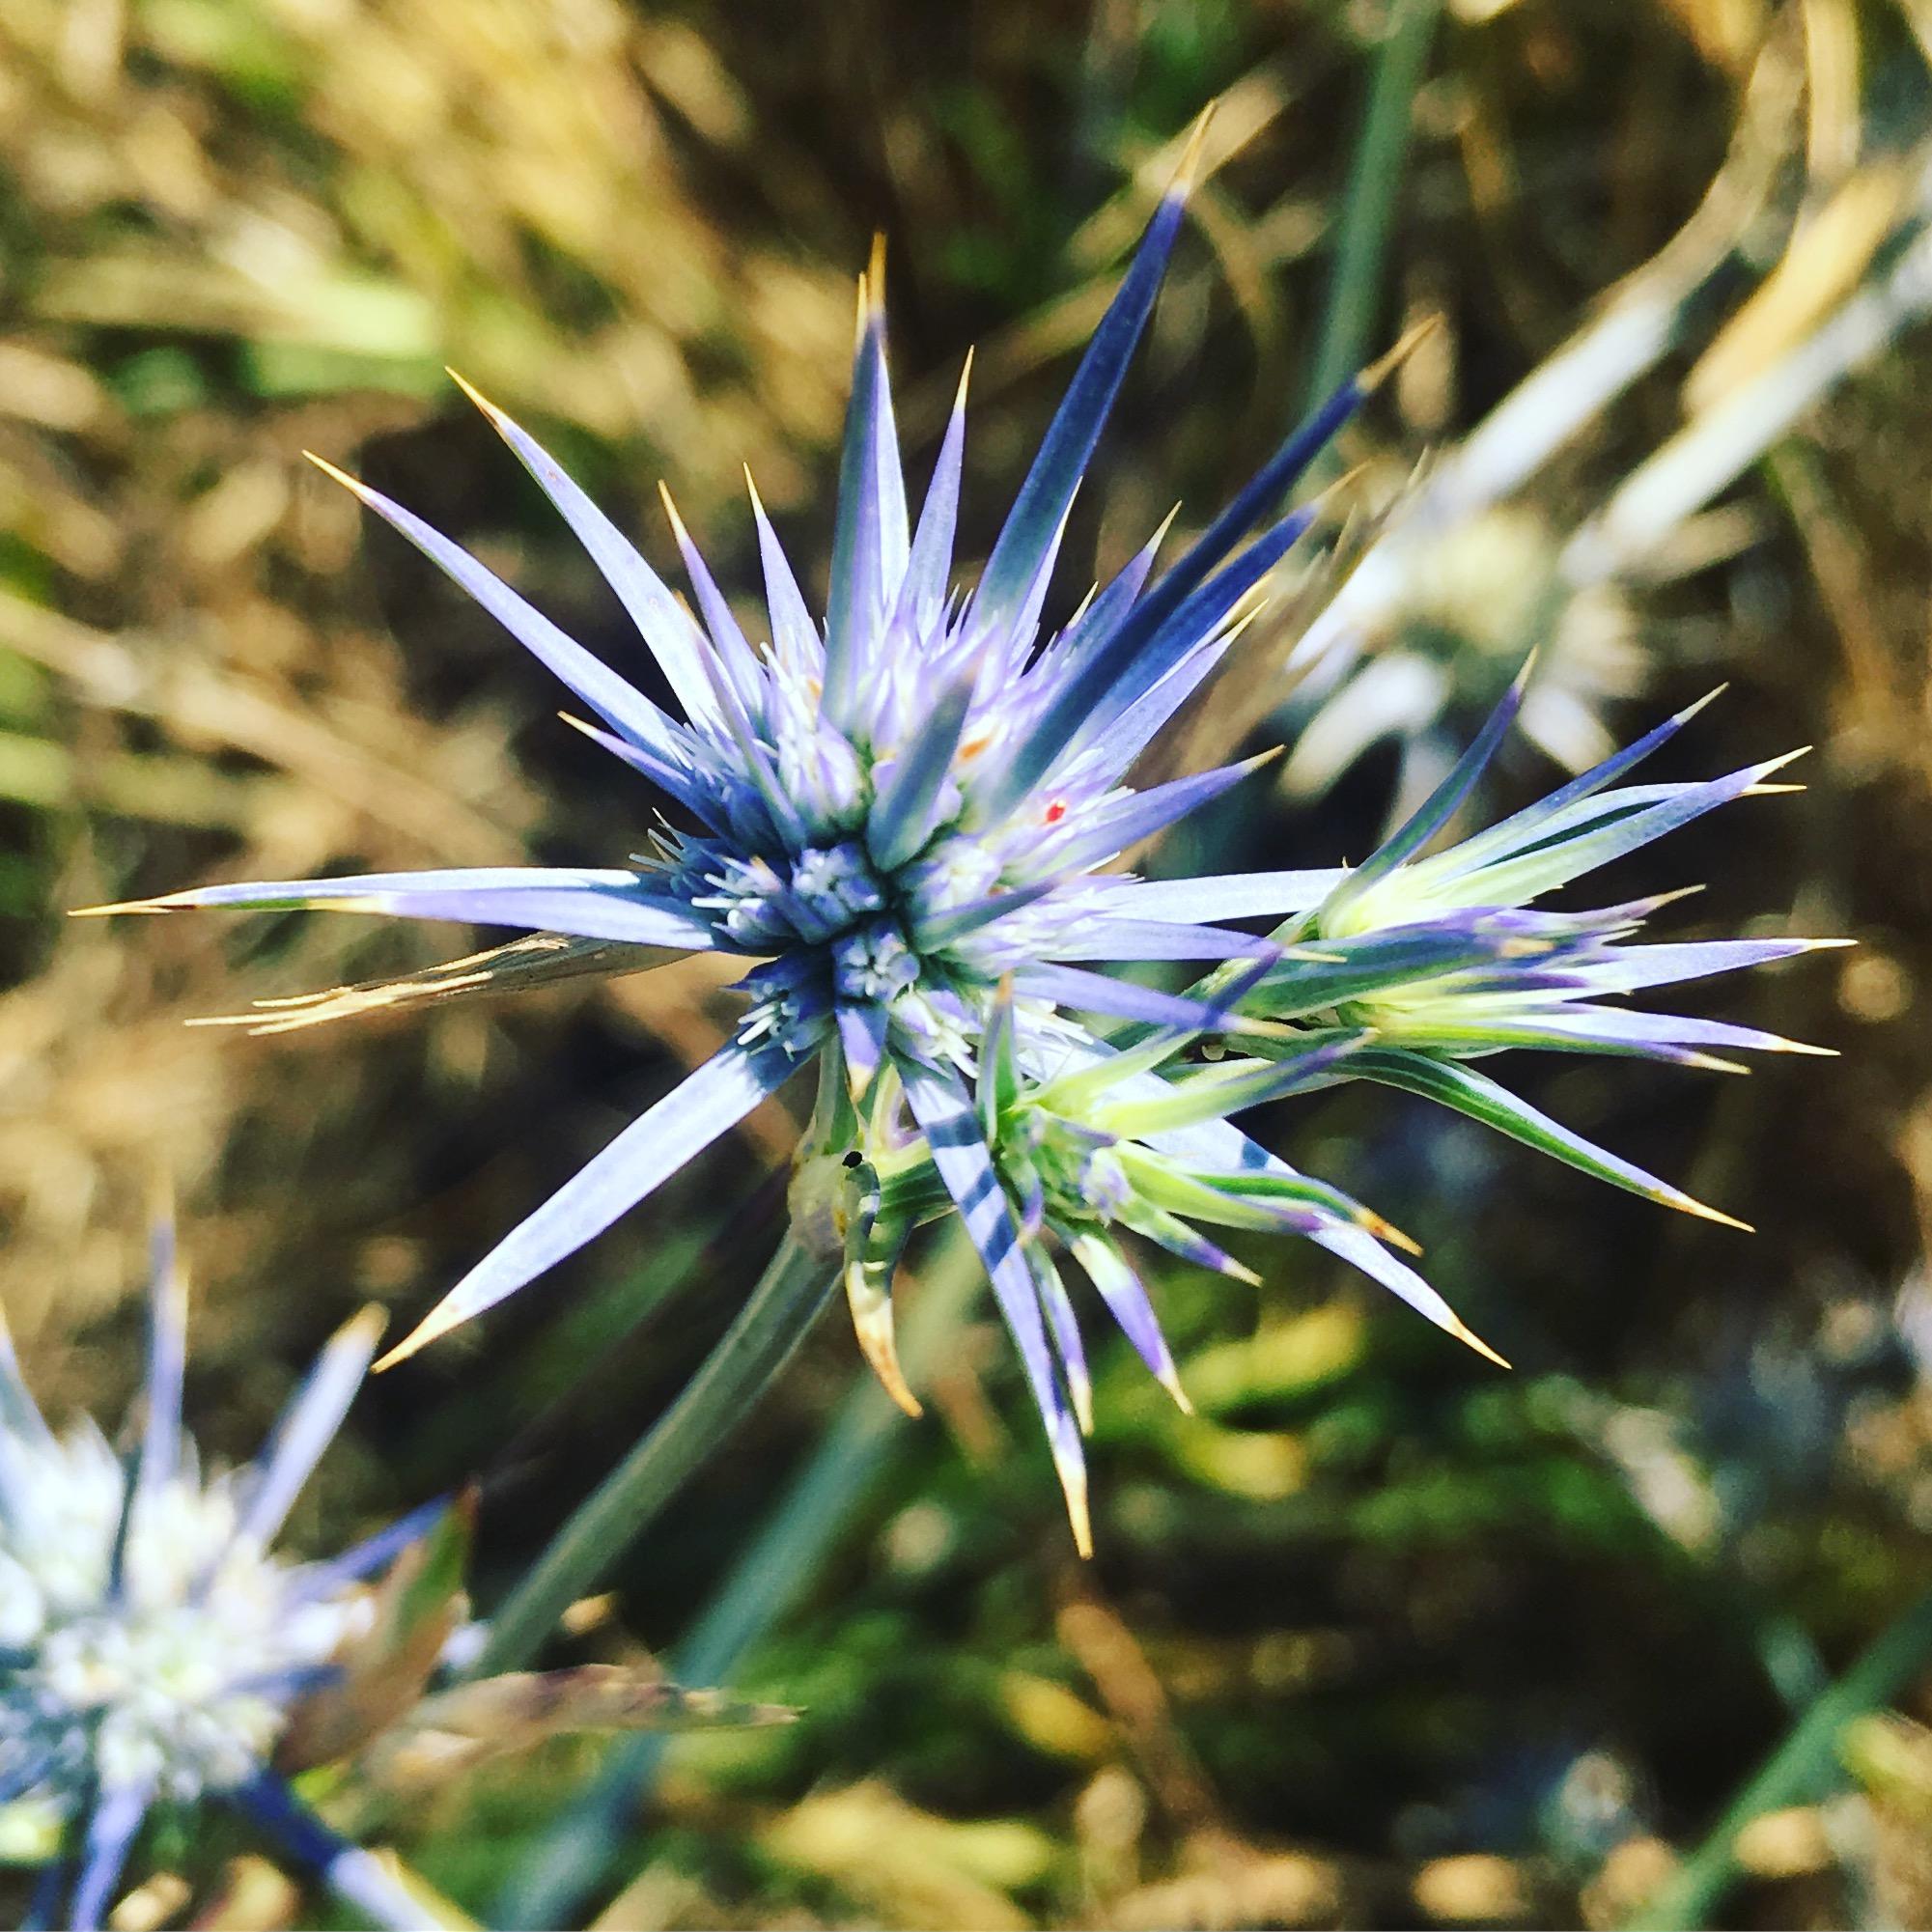 A Blue Devil ( Eryngium ovinum ), one of many native plants found in Melbourne's Royal Park. Image:Donna Lo Bartolo Shiel